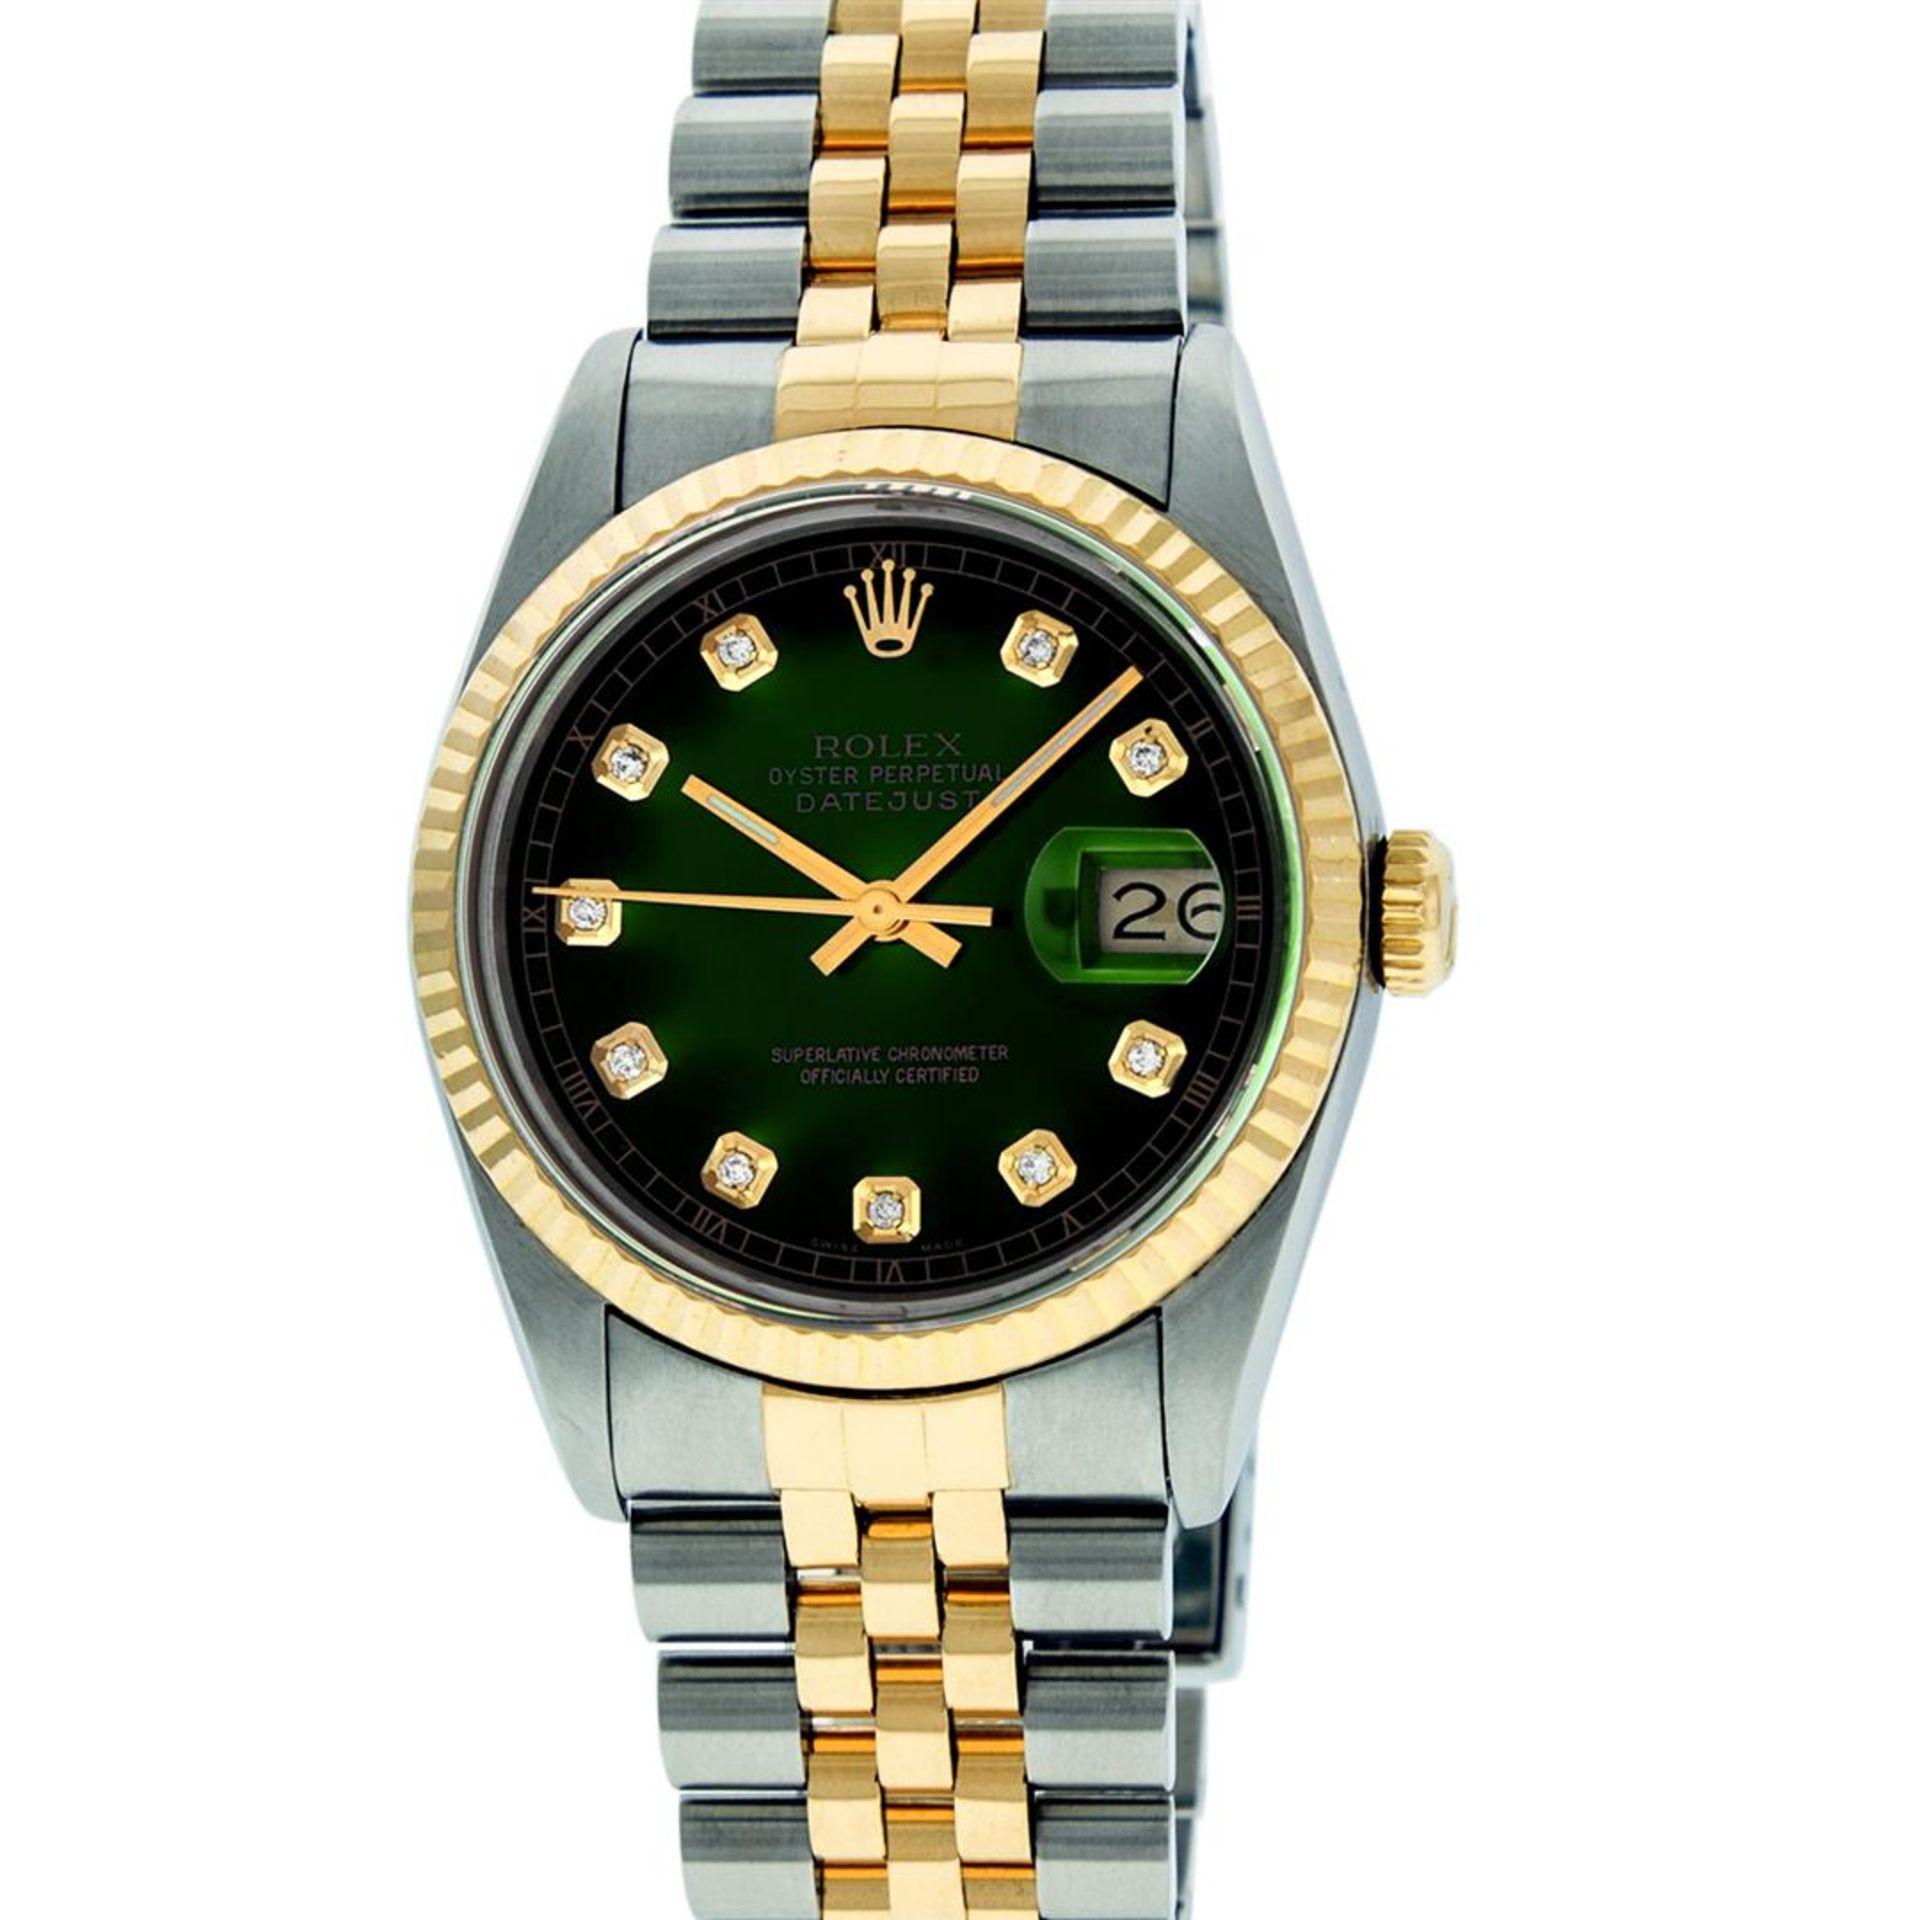 Rolex Mens 2 Tone MOP Diamond 36MM Datejust Wristwatch - Image 2 of 7